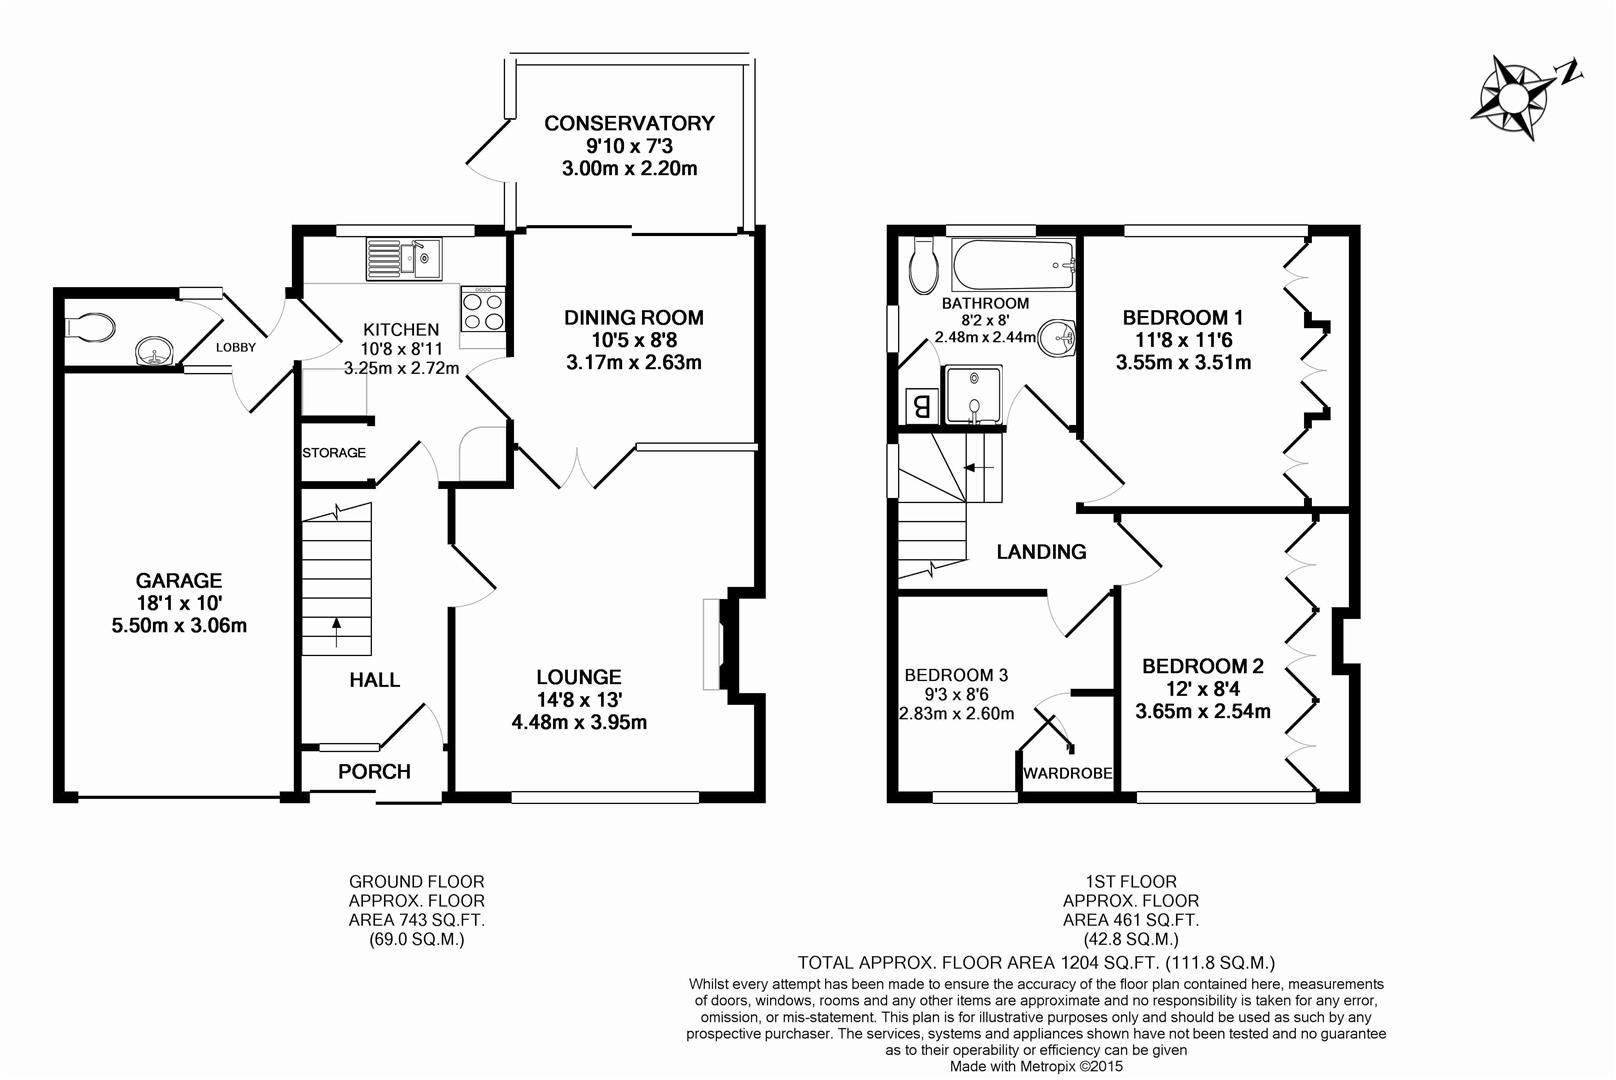 3 Bedroom Property For Sale In Alveston Bristol Guide